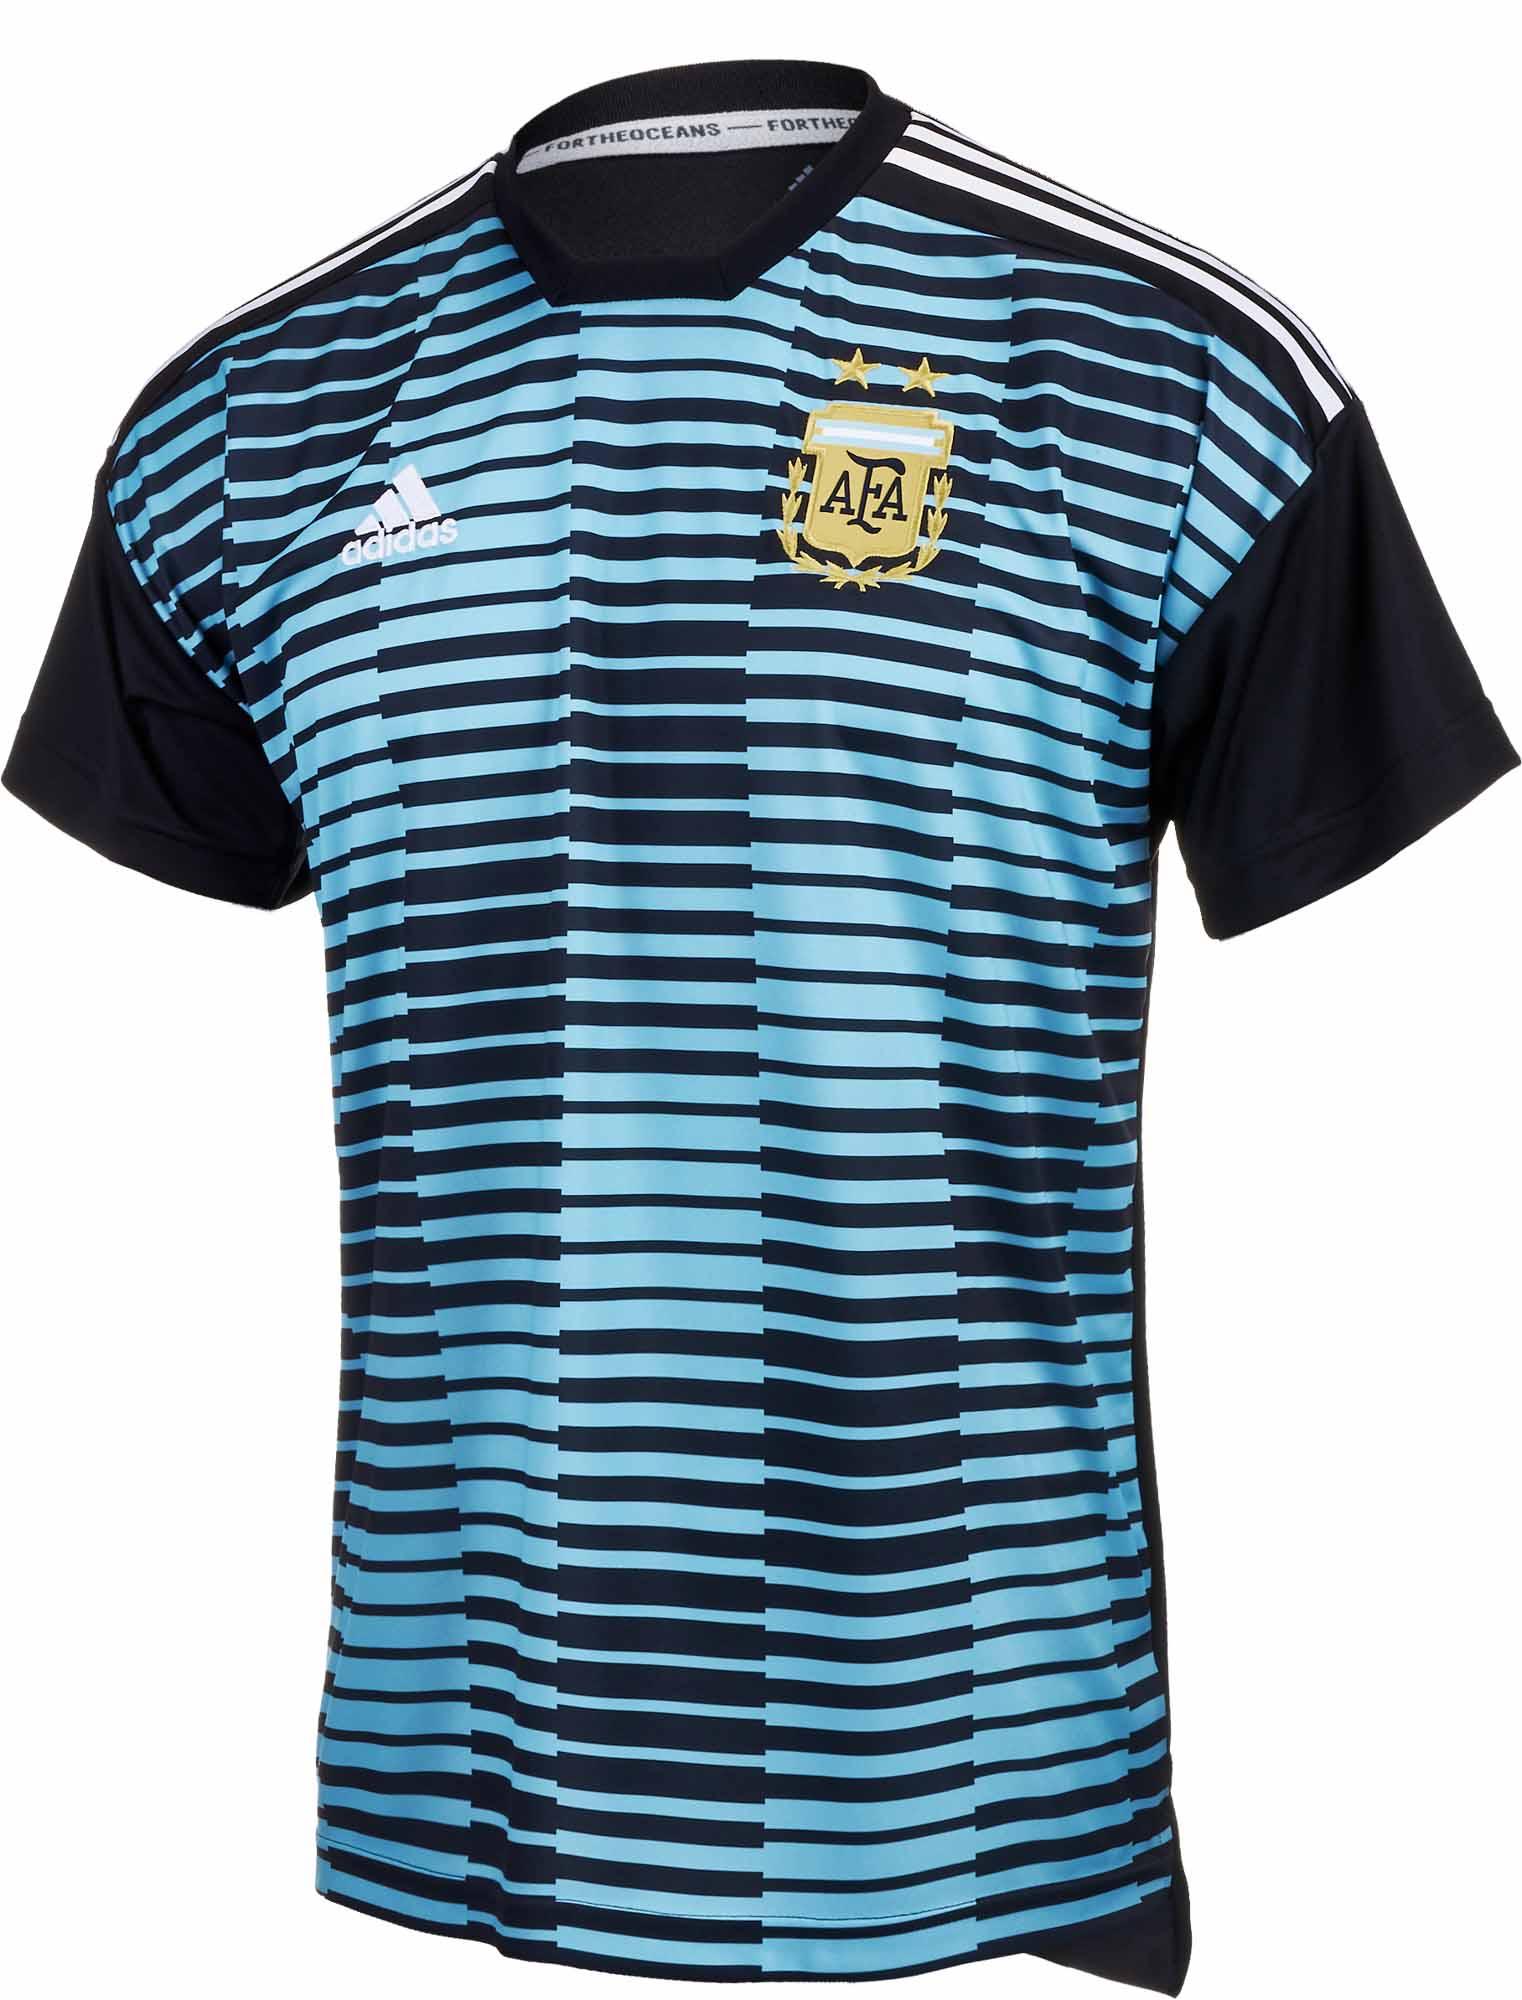 34cbd65cf409 adidas Argentina Pre-match Jersey - Blue   Black - Soccer Master